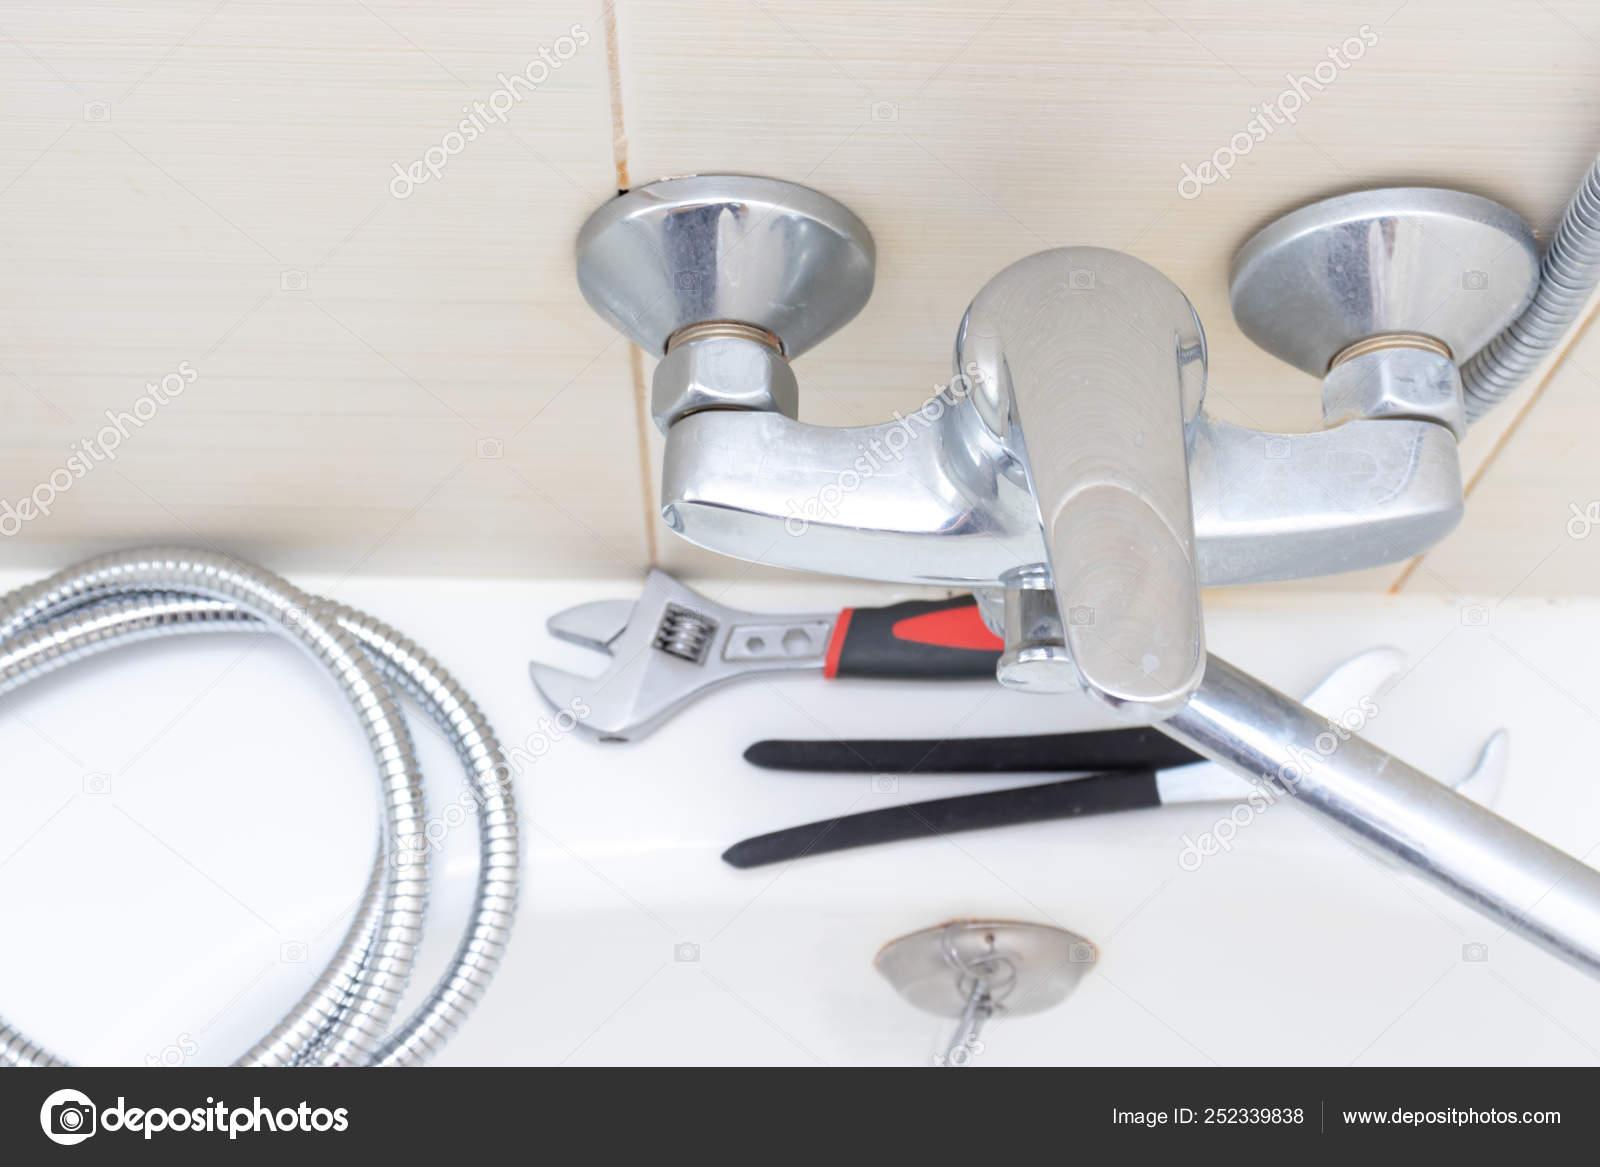 https depositphotos com 252339838 stock photo shower water tap faucet repair html